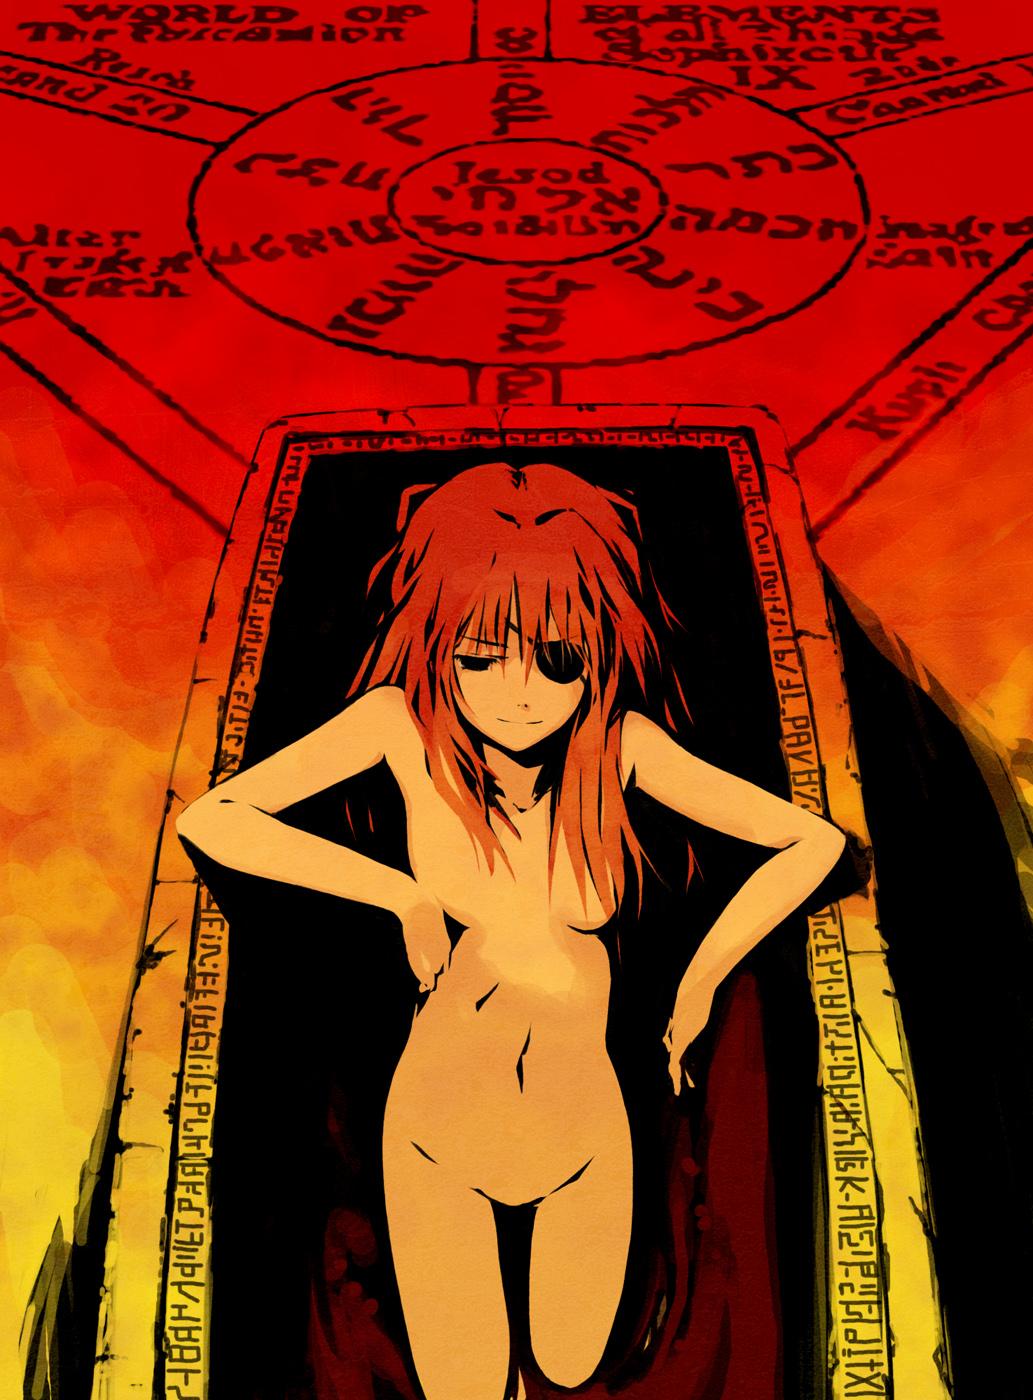 neon scene genesis nude evangelion Hands free ejaculation how to